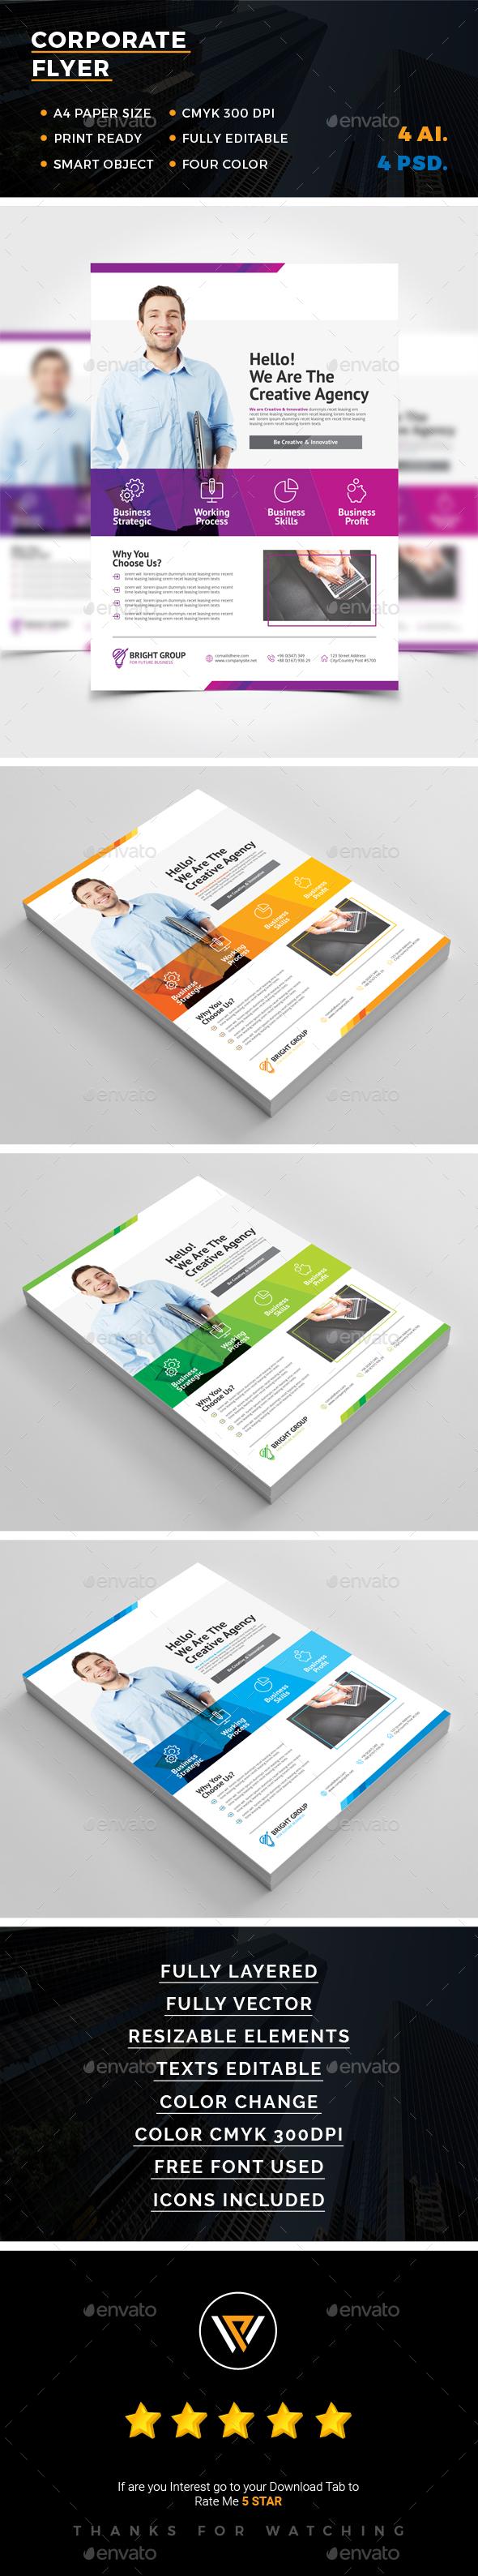 Corporate Flyer Template PSD, AI Illustrator | Flyer Templates ...